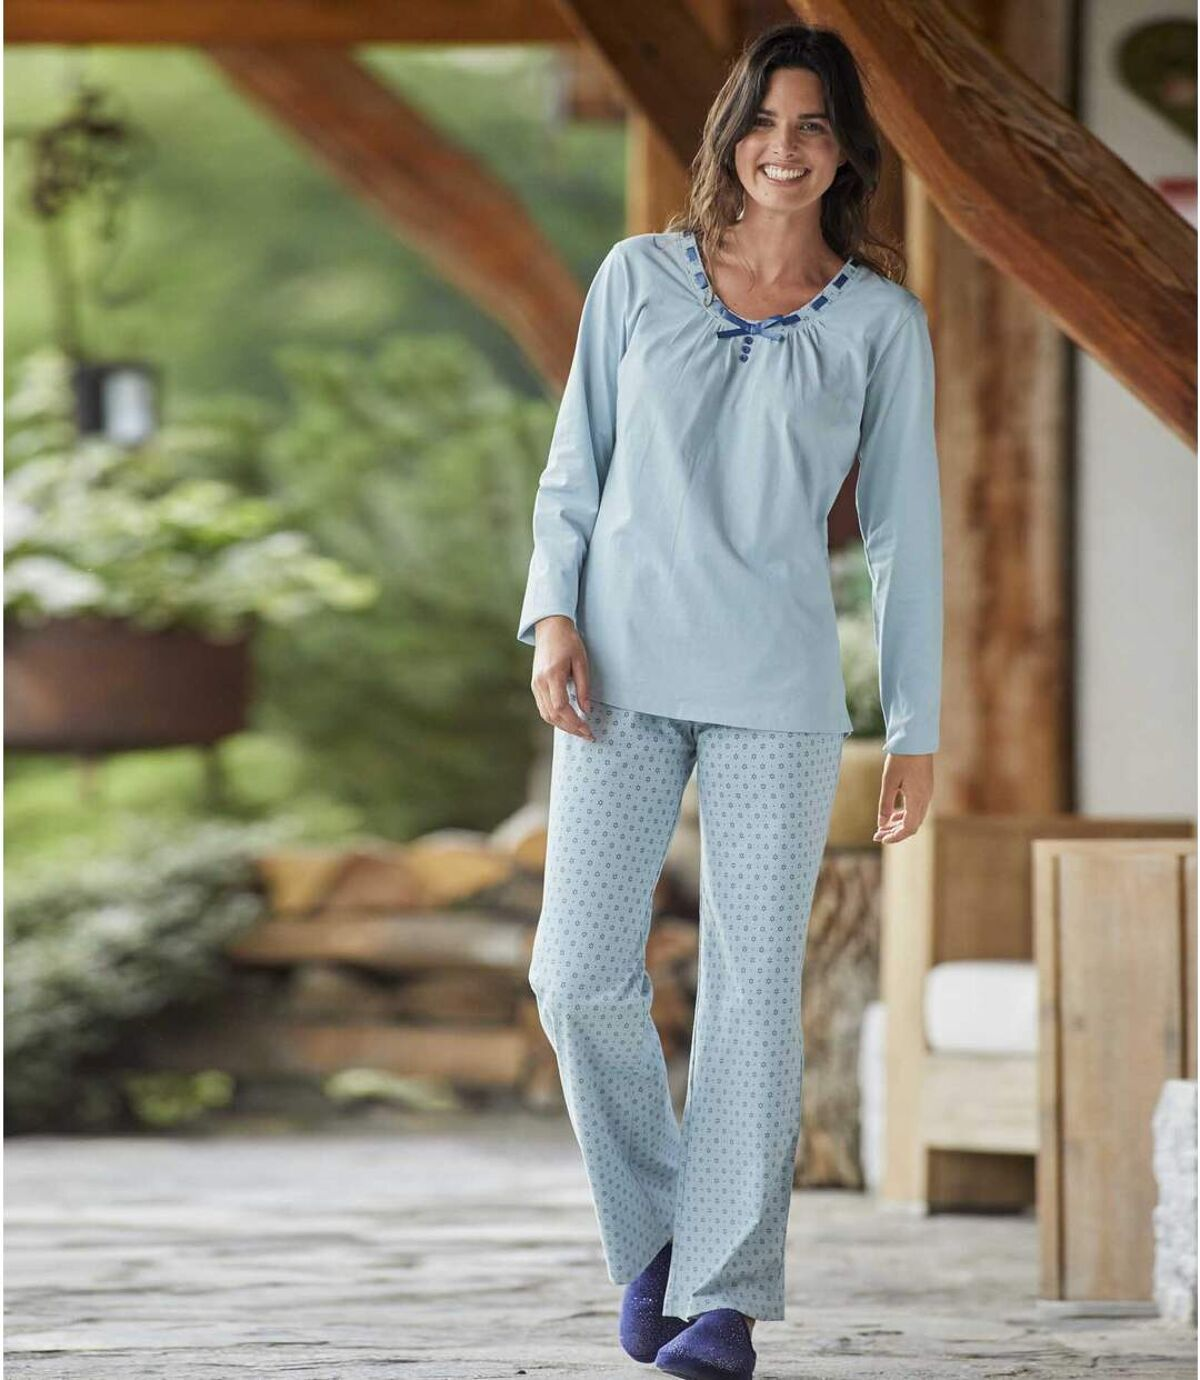 Blauer Pyjama Phantasie Atlas For Men